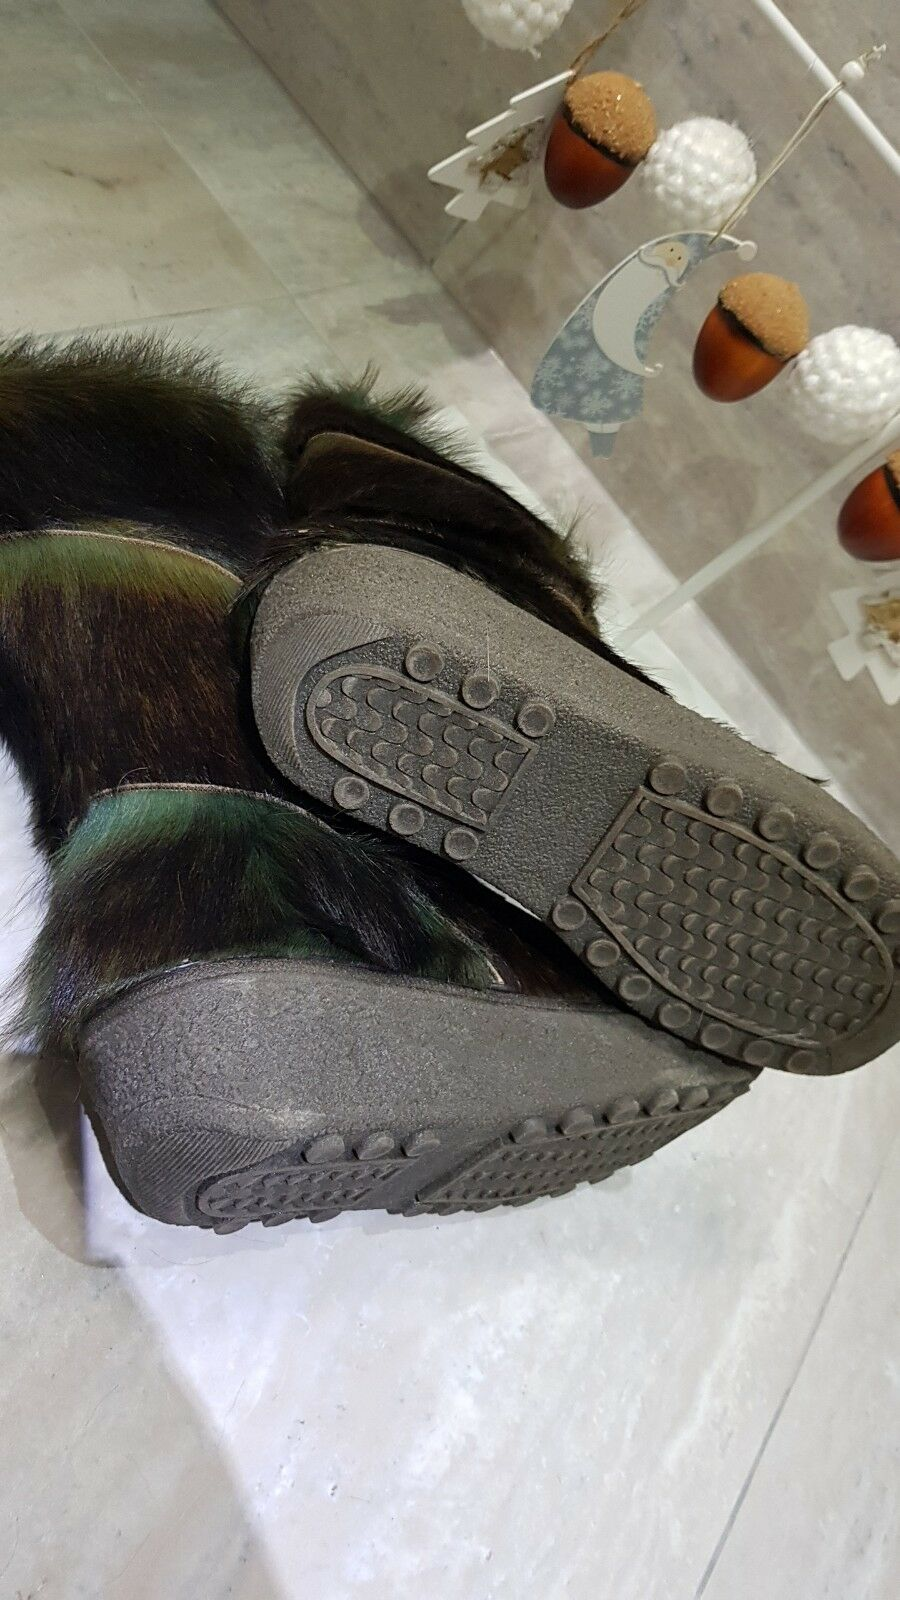 NEU NEU NEU Rare Yeti Fell Stiefel Grüntöne 40,5 Pelz Fur Goat Stiefel After Ski Vintage 868cef